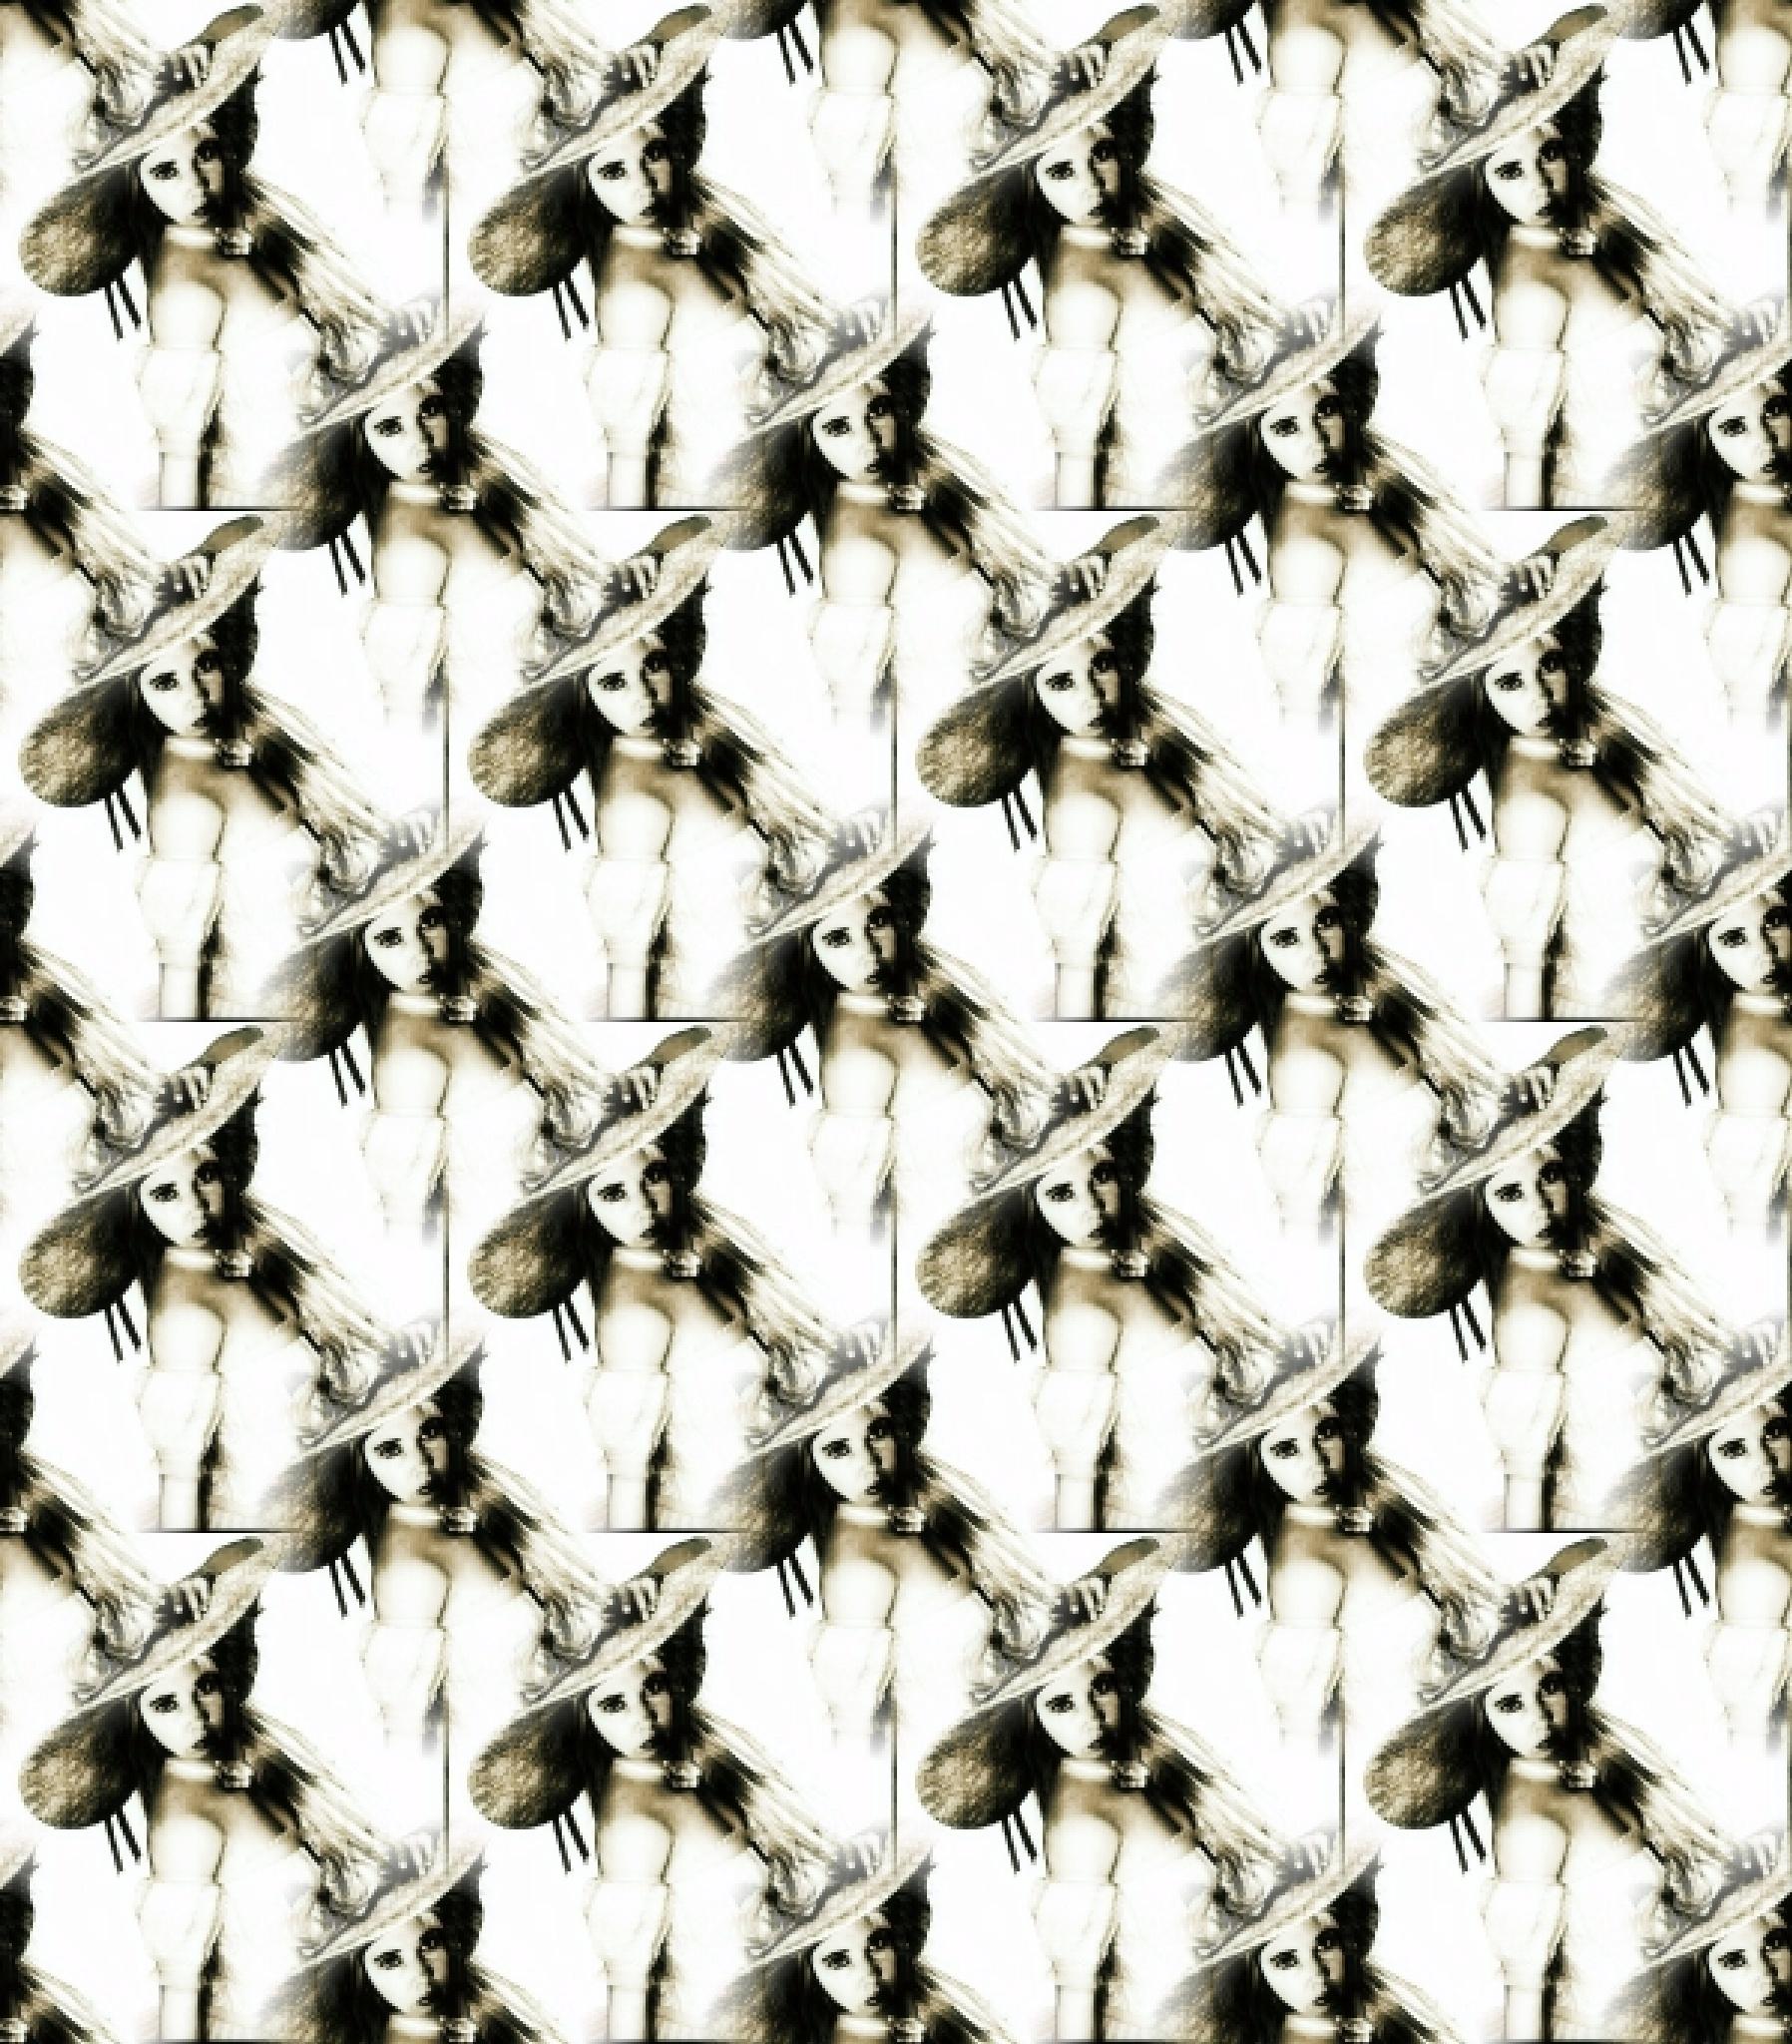 The Clones by Jen Sulser